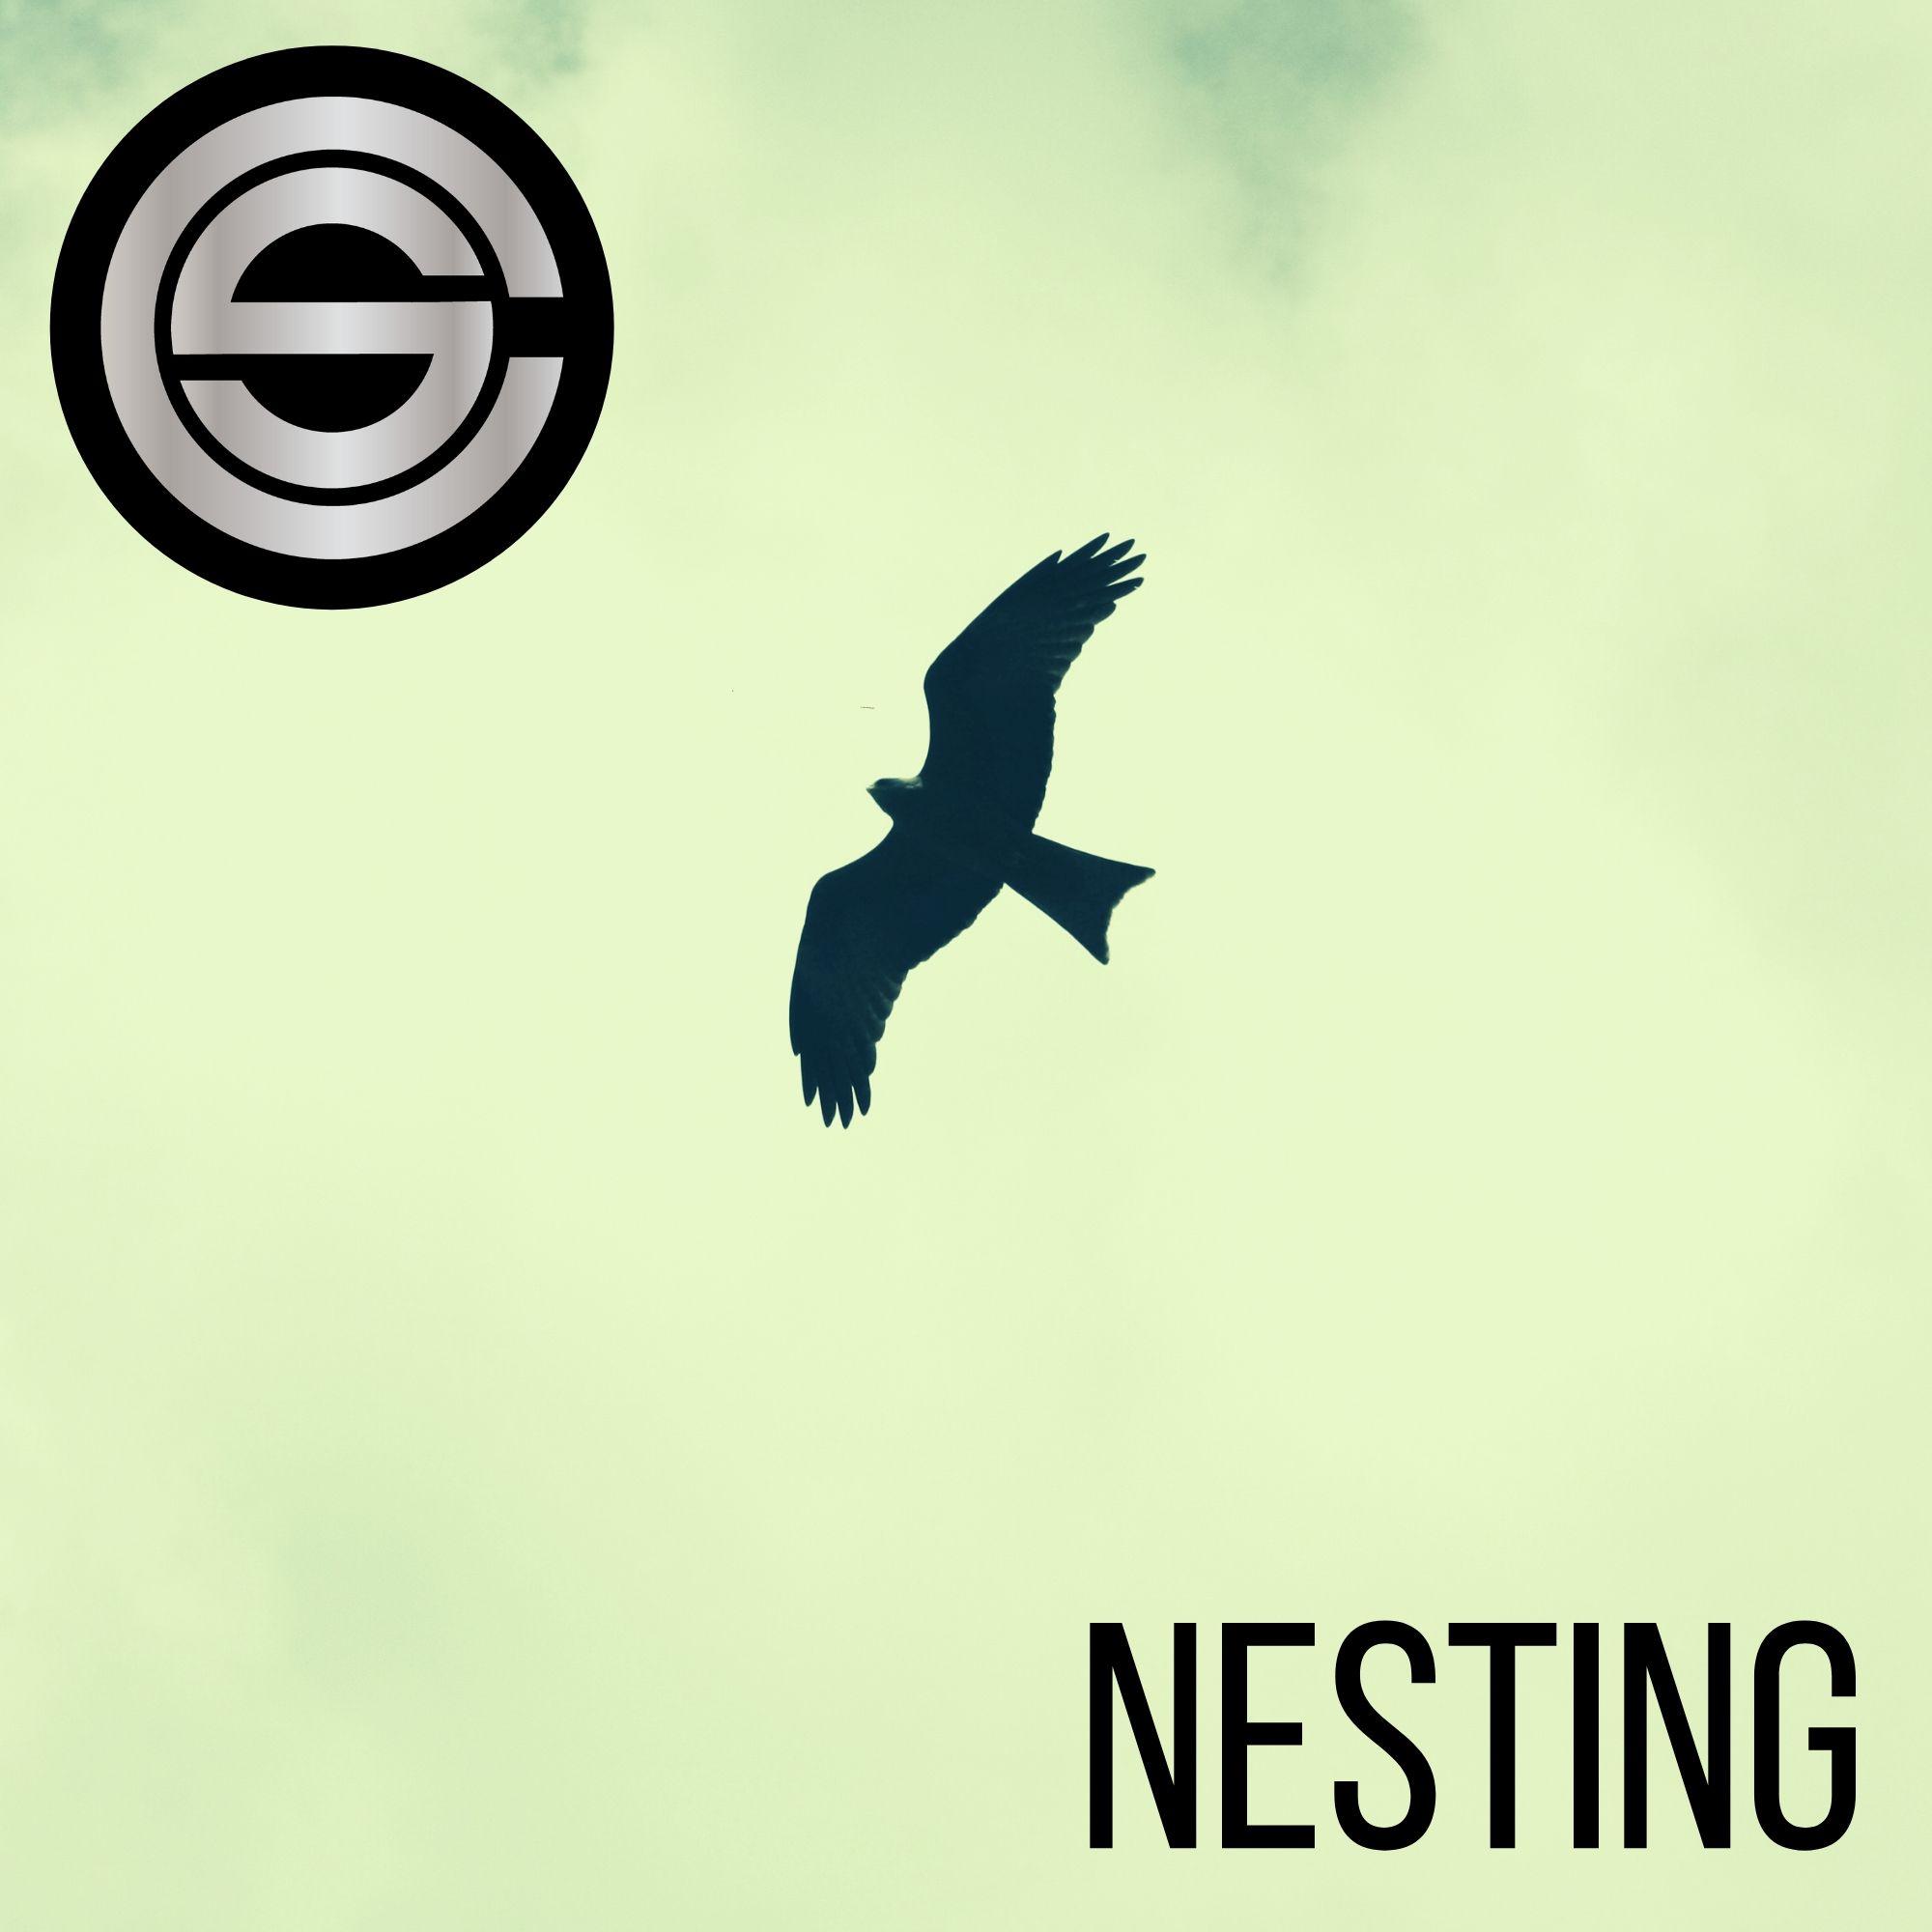 Nesting by Chris Swan